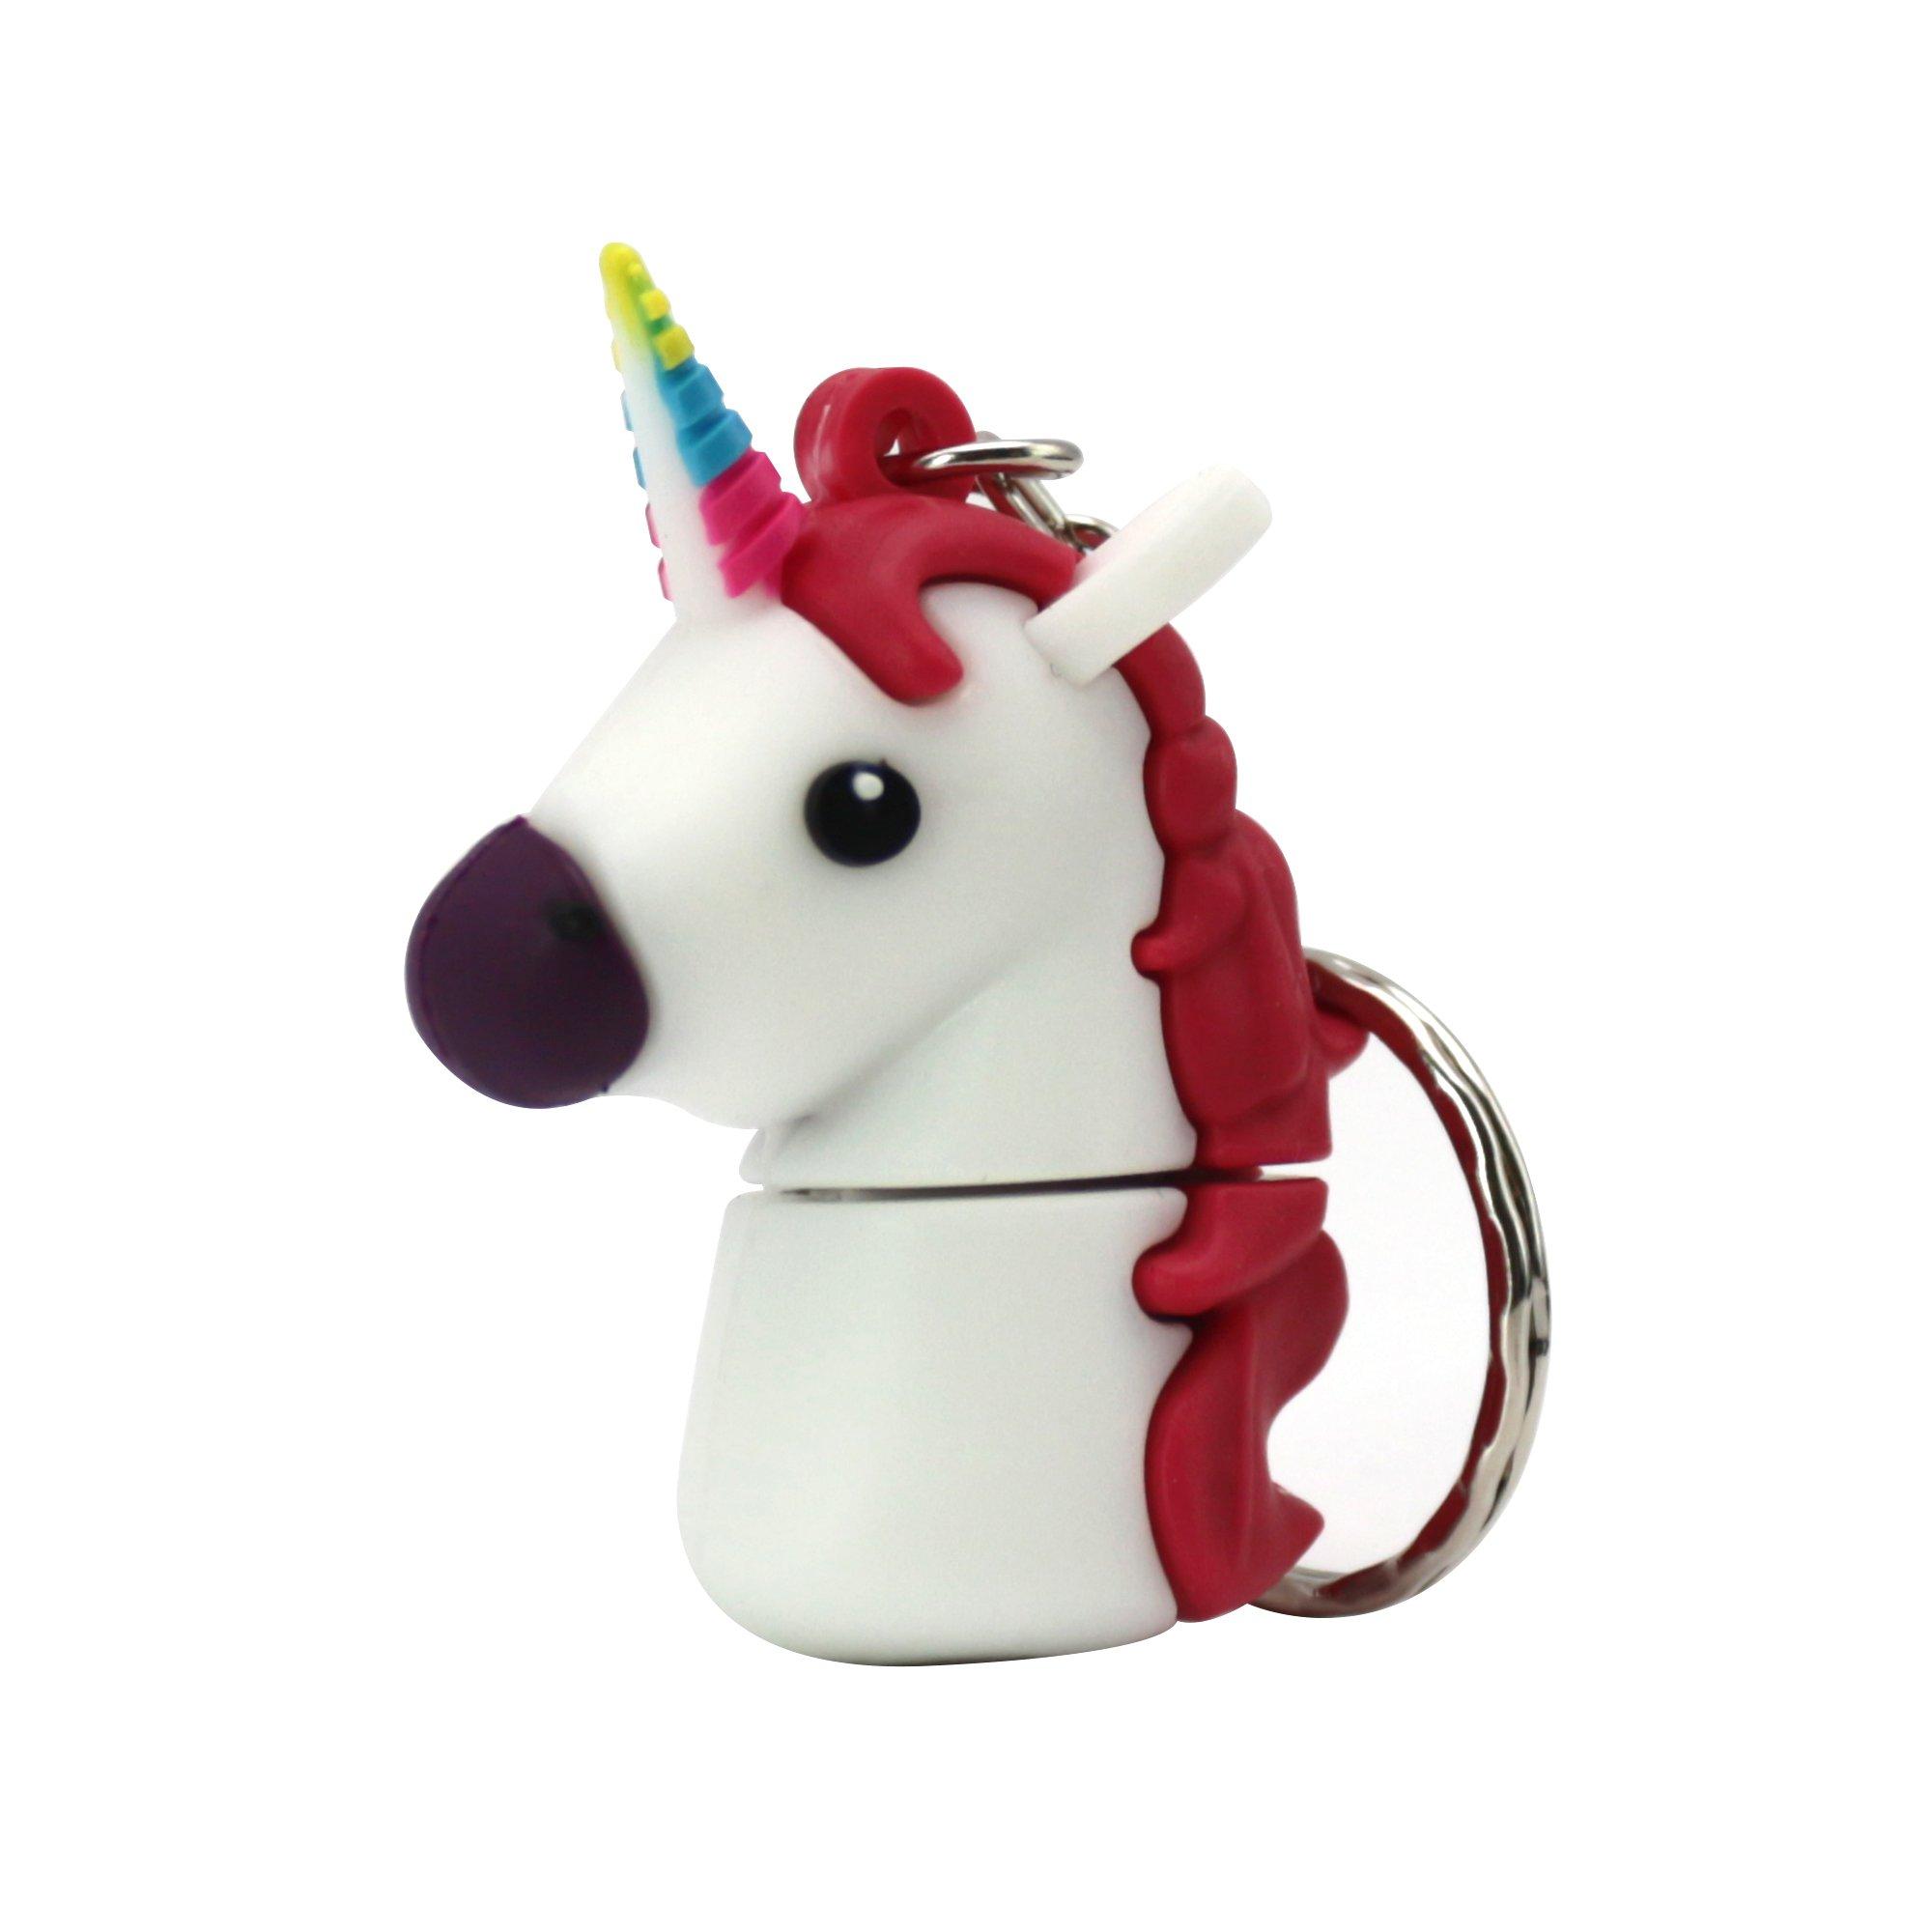 Sundiao Lovely Cartoon Unicorn PVC USB Flash Drive 2.0 Cute Gift USB Flash Memory Disk USB Flash Stick Pen Drive (32GB, White)